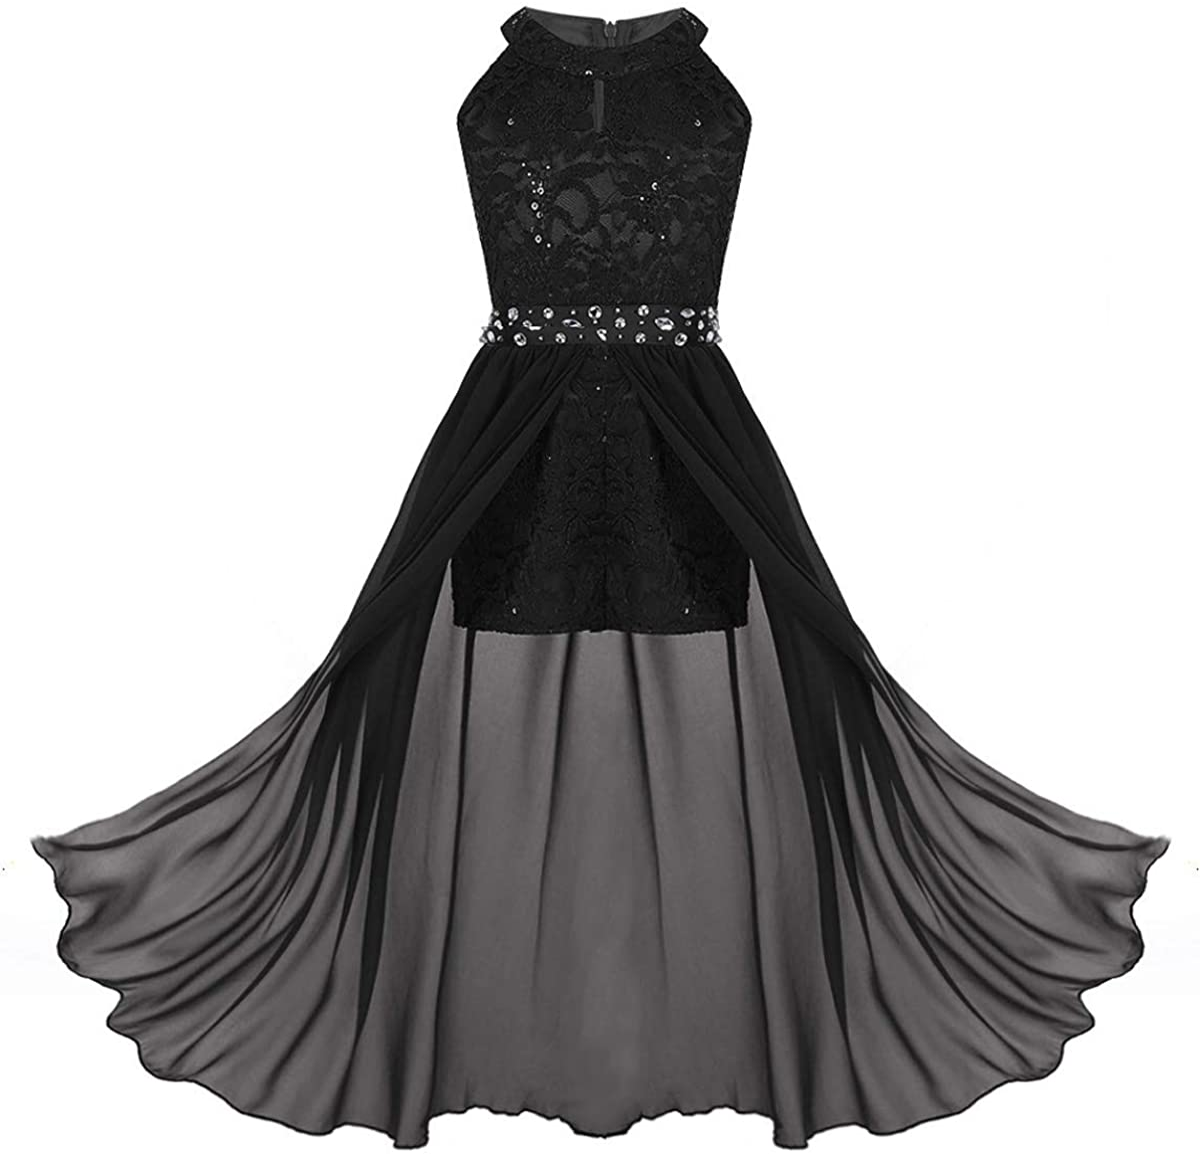 moily Kids Girls High Turtleneck Floral Lace Rhinestone Long Romper Dress Formal Ball Gown Dancewear